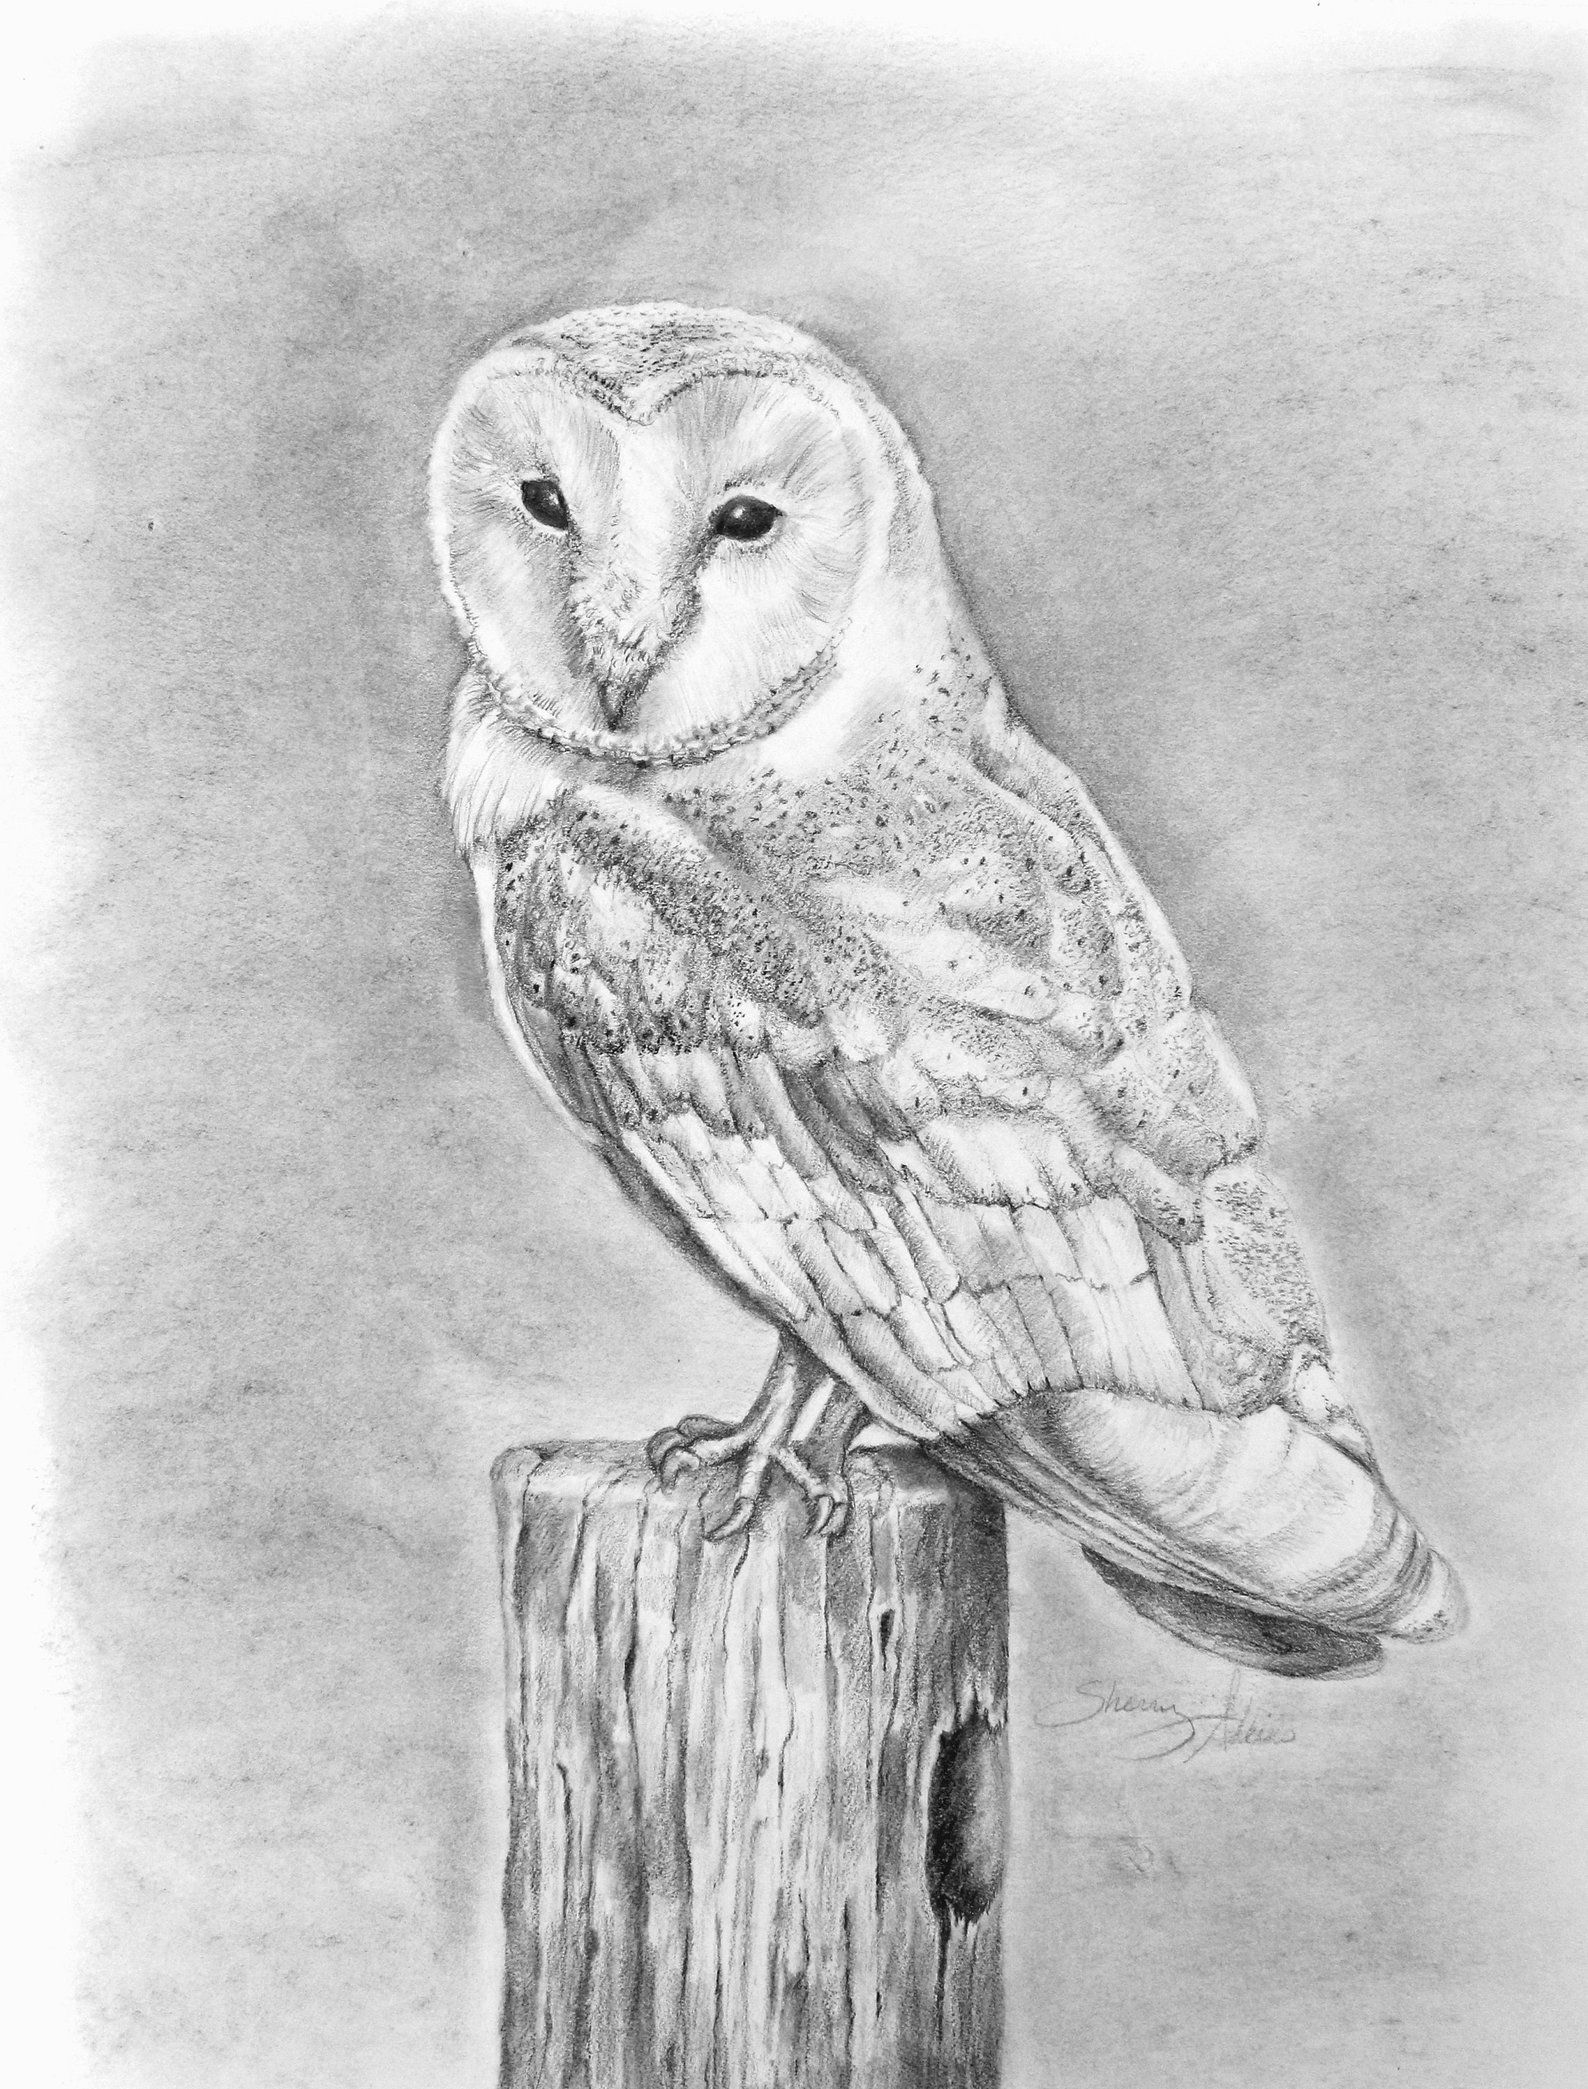 Barn owl pencil drawing print | Etsy | Owls drawing, Cool ...